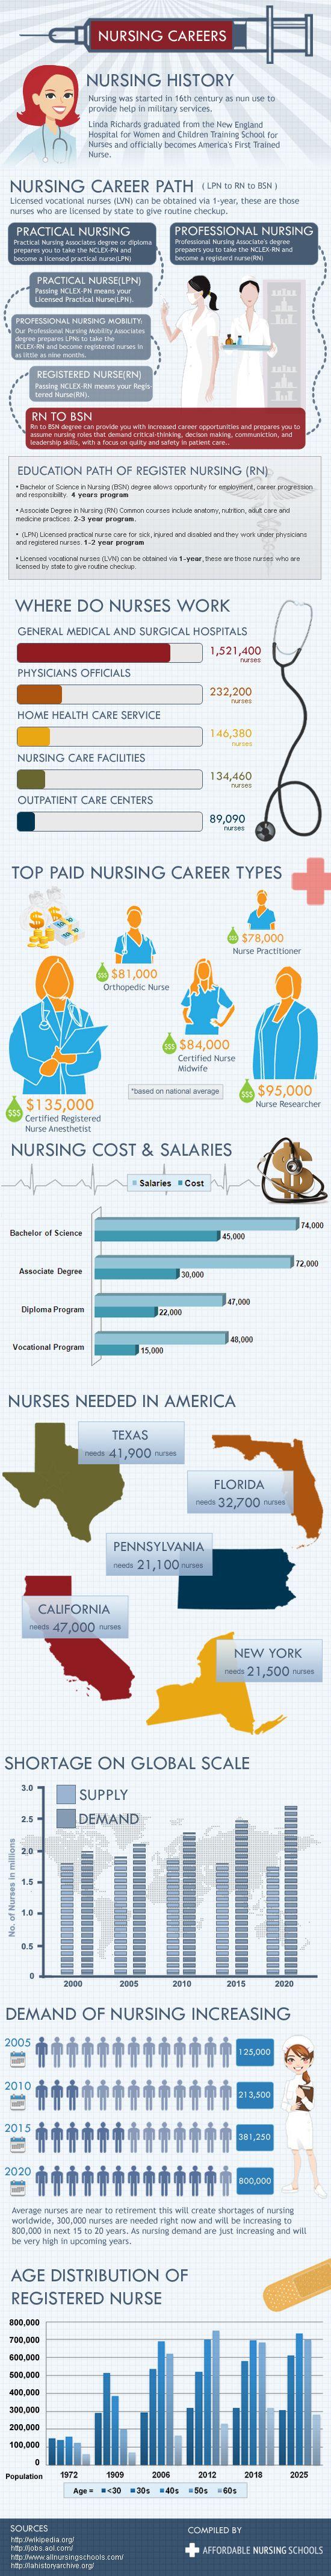 What Is Nursing?